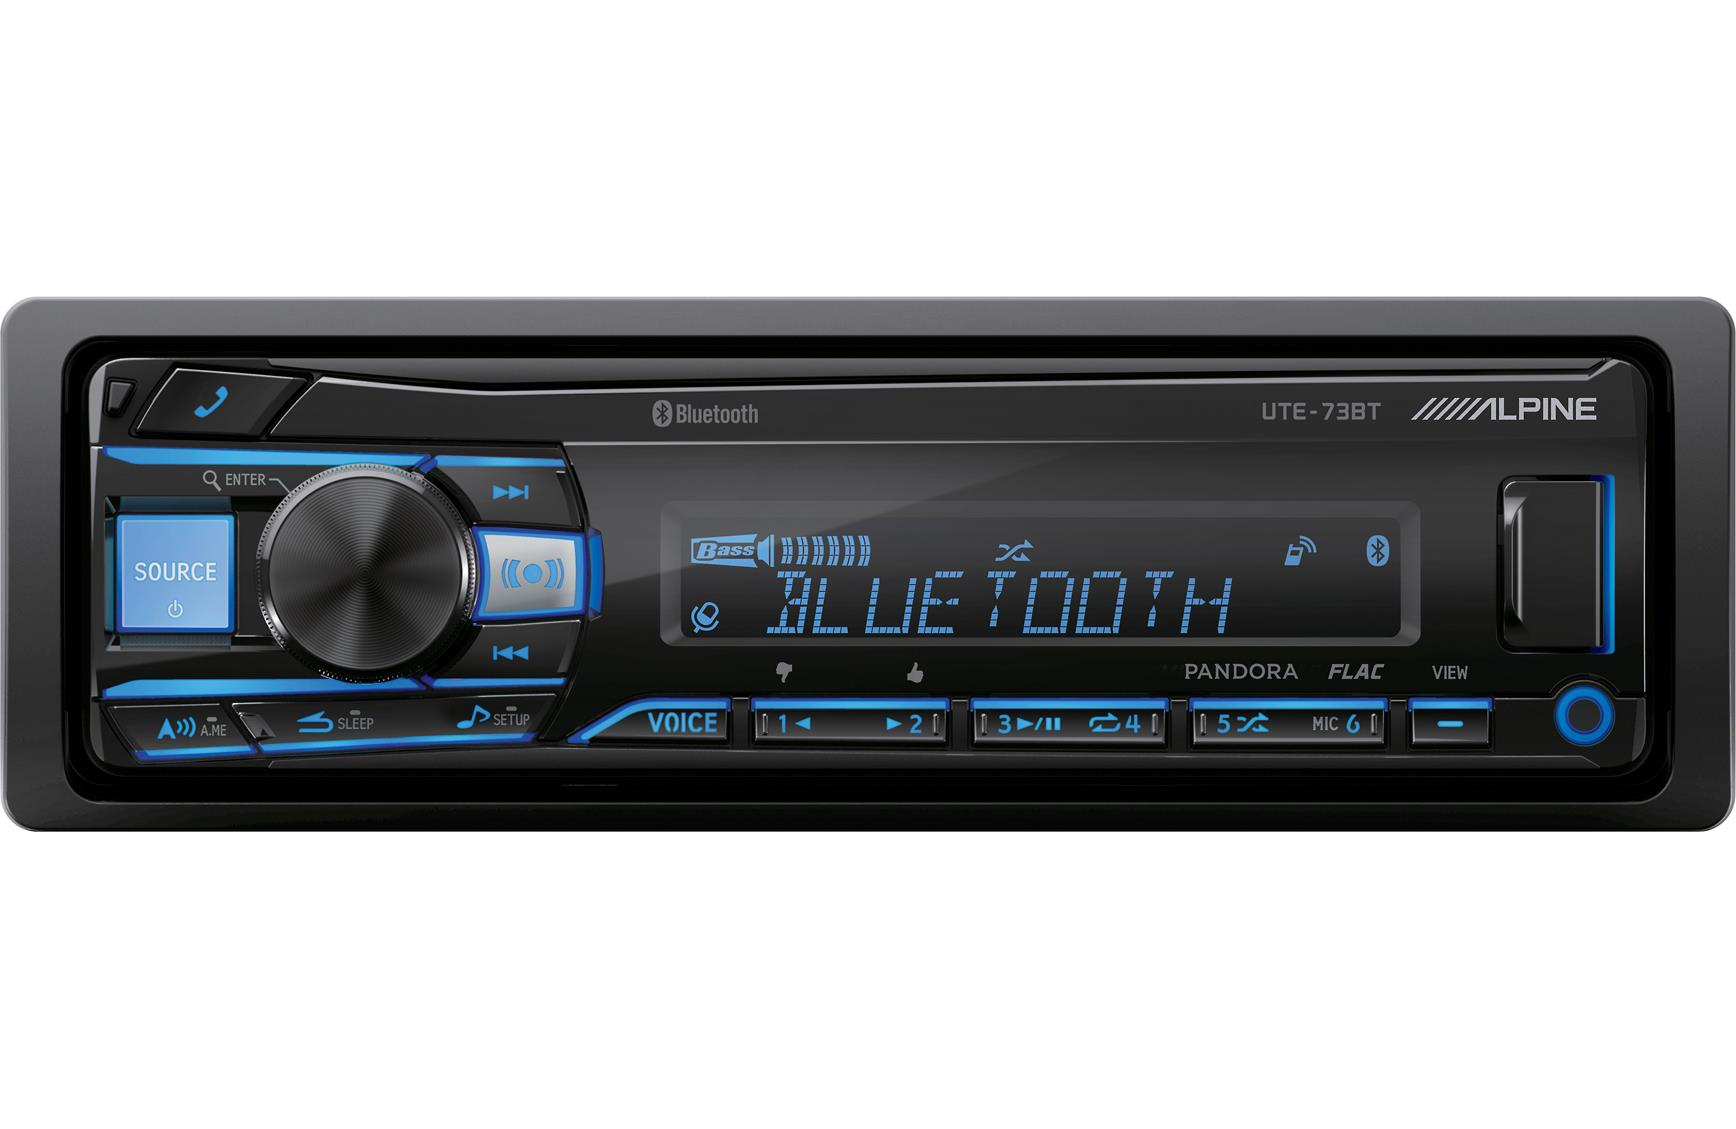 Alpine UTE-73BT Car Stereo Single DIN Digital Media USB AUX